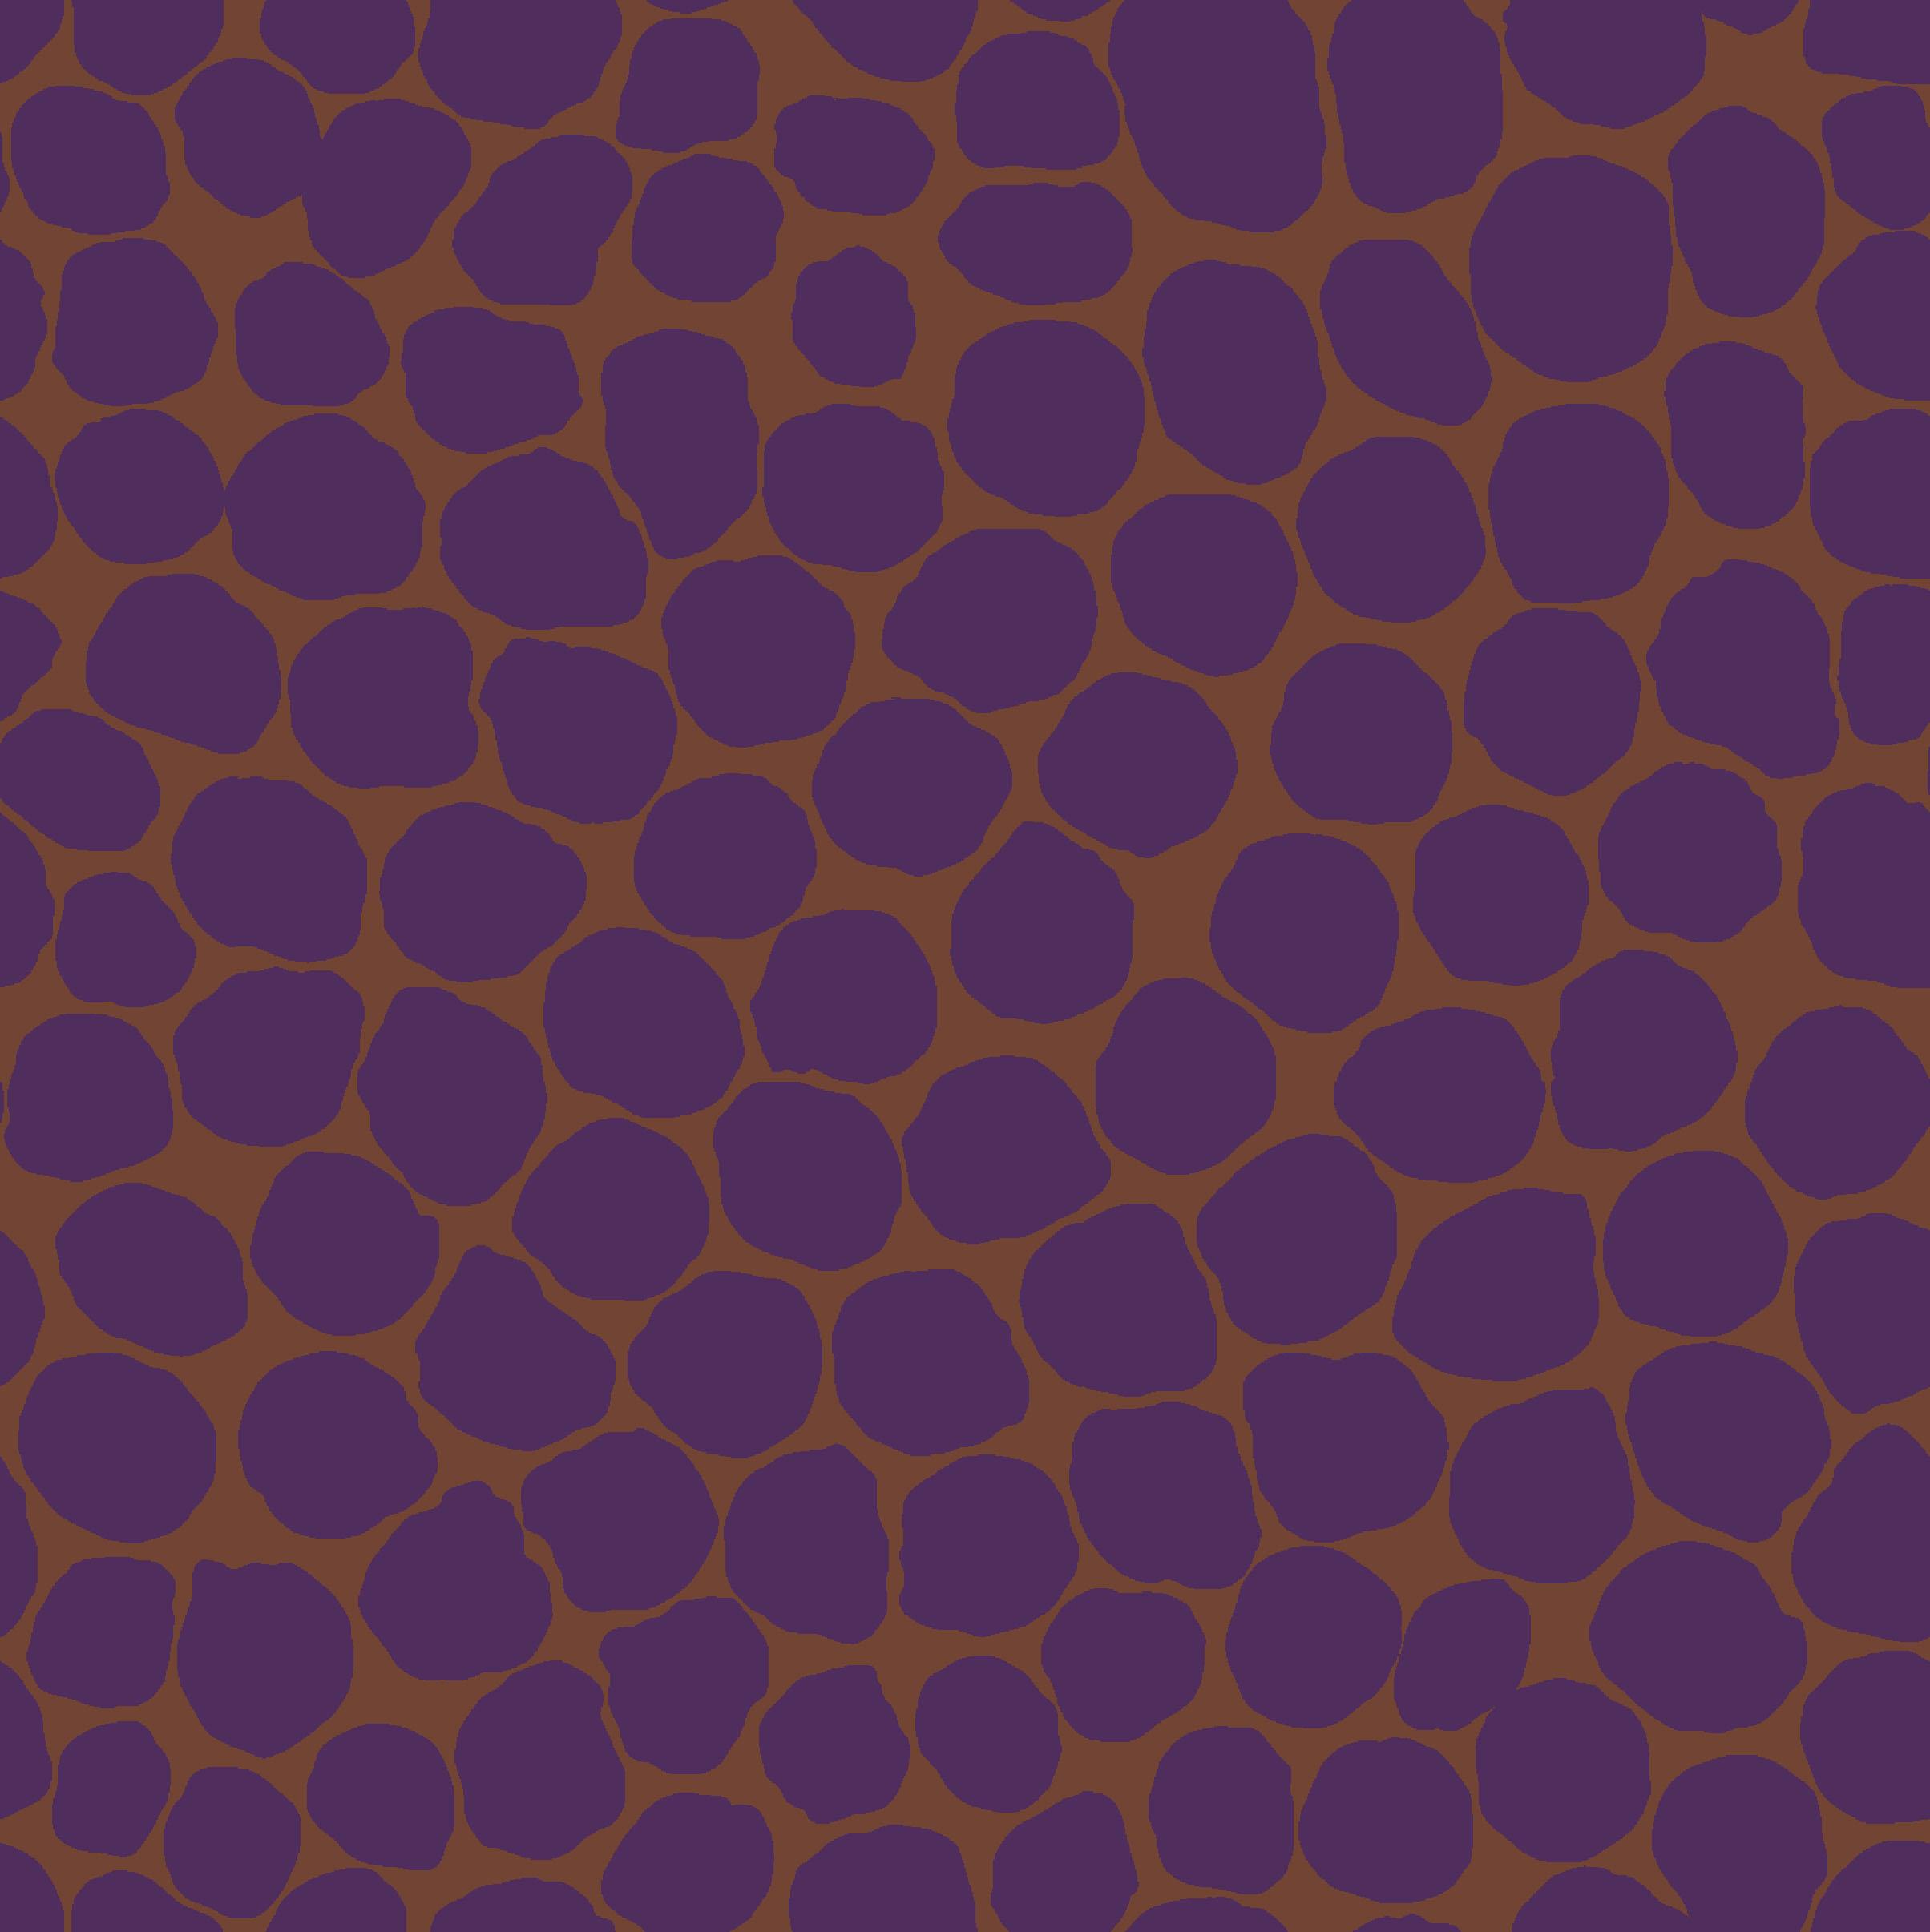 Jumble - PWBM053 - Prune